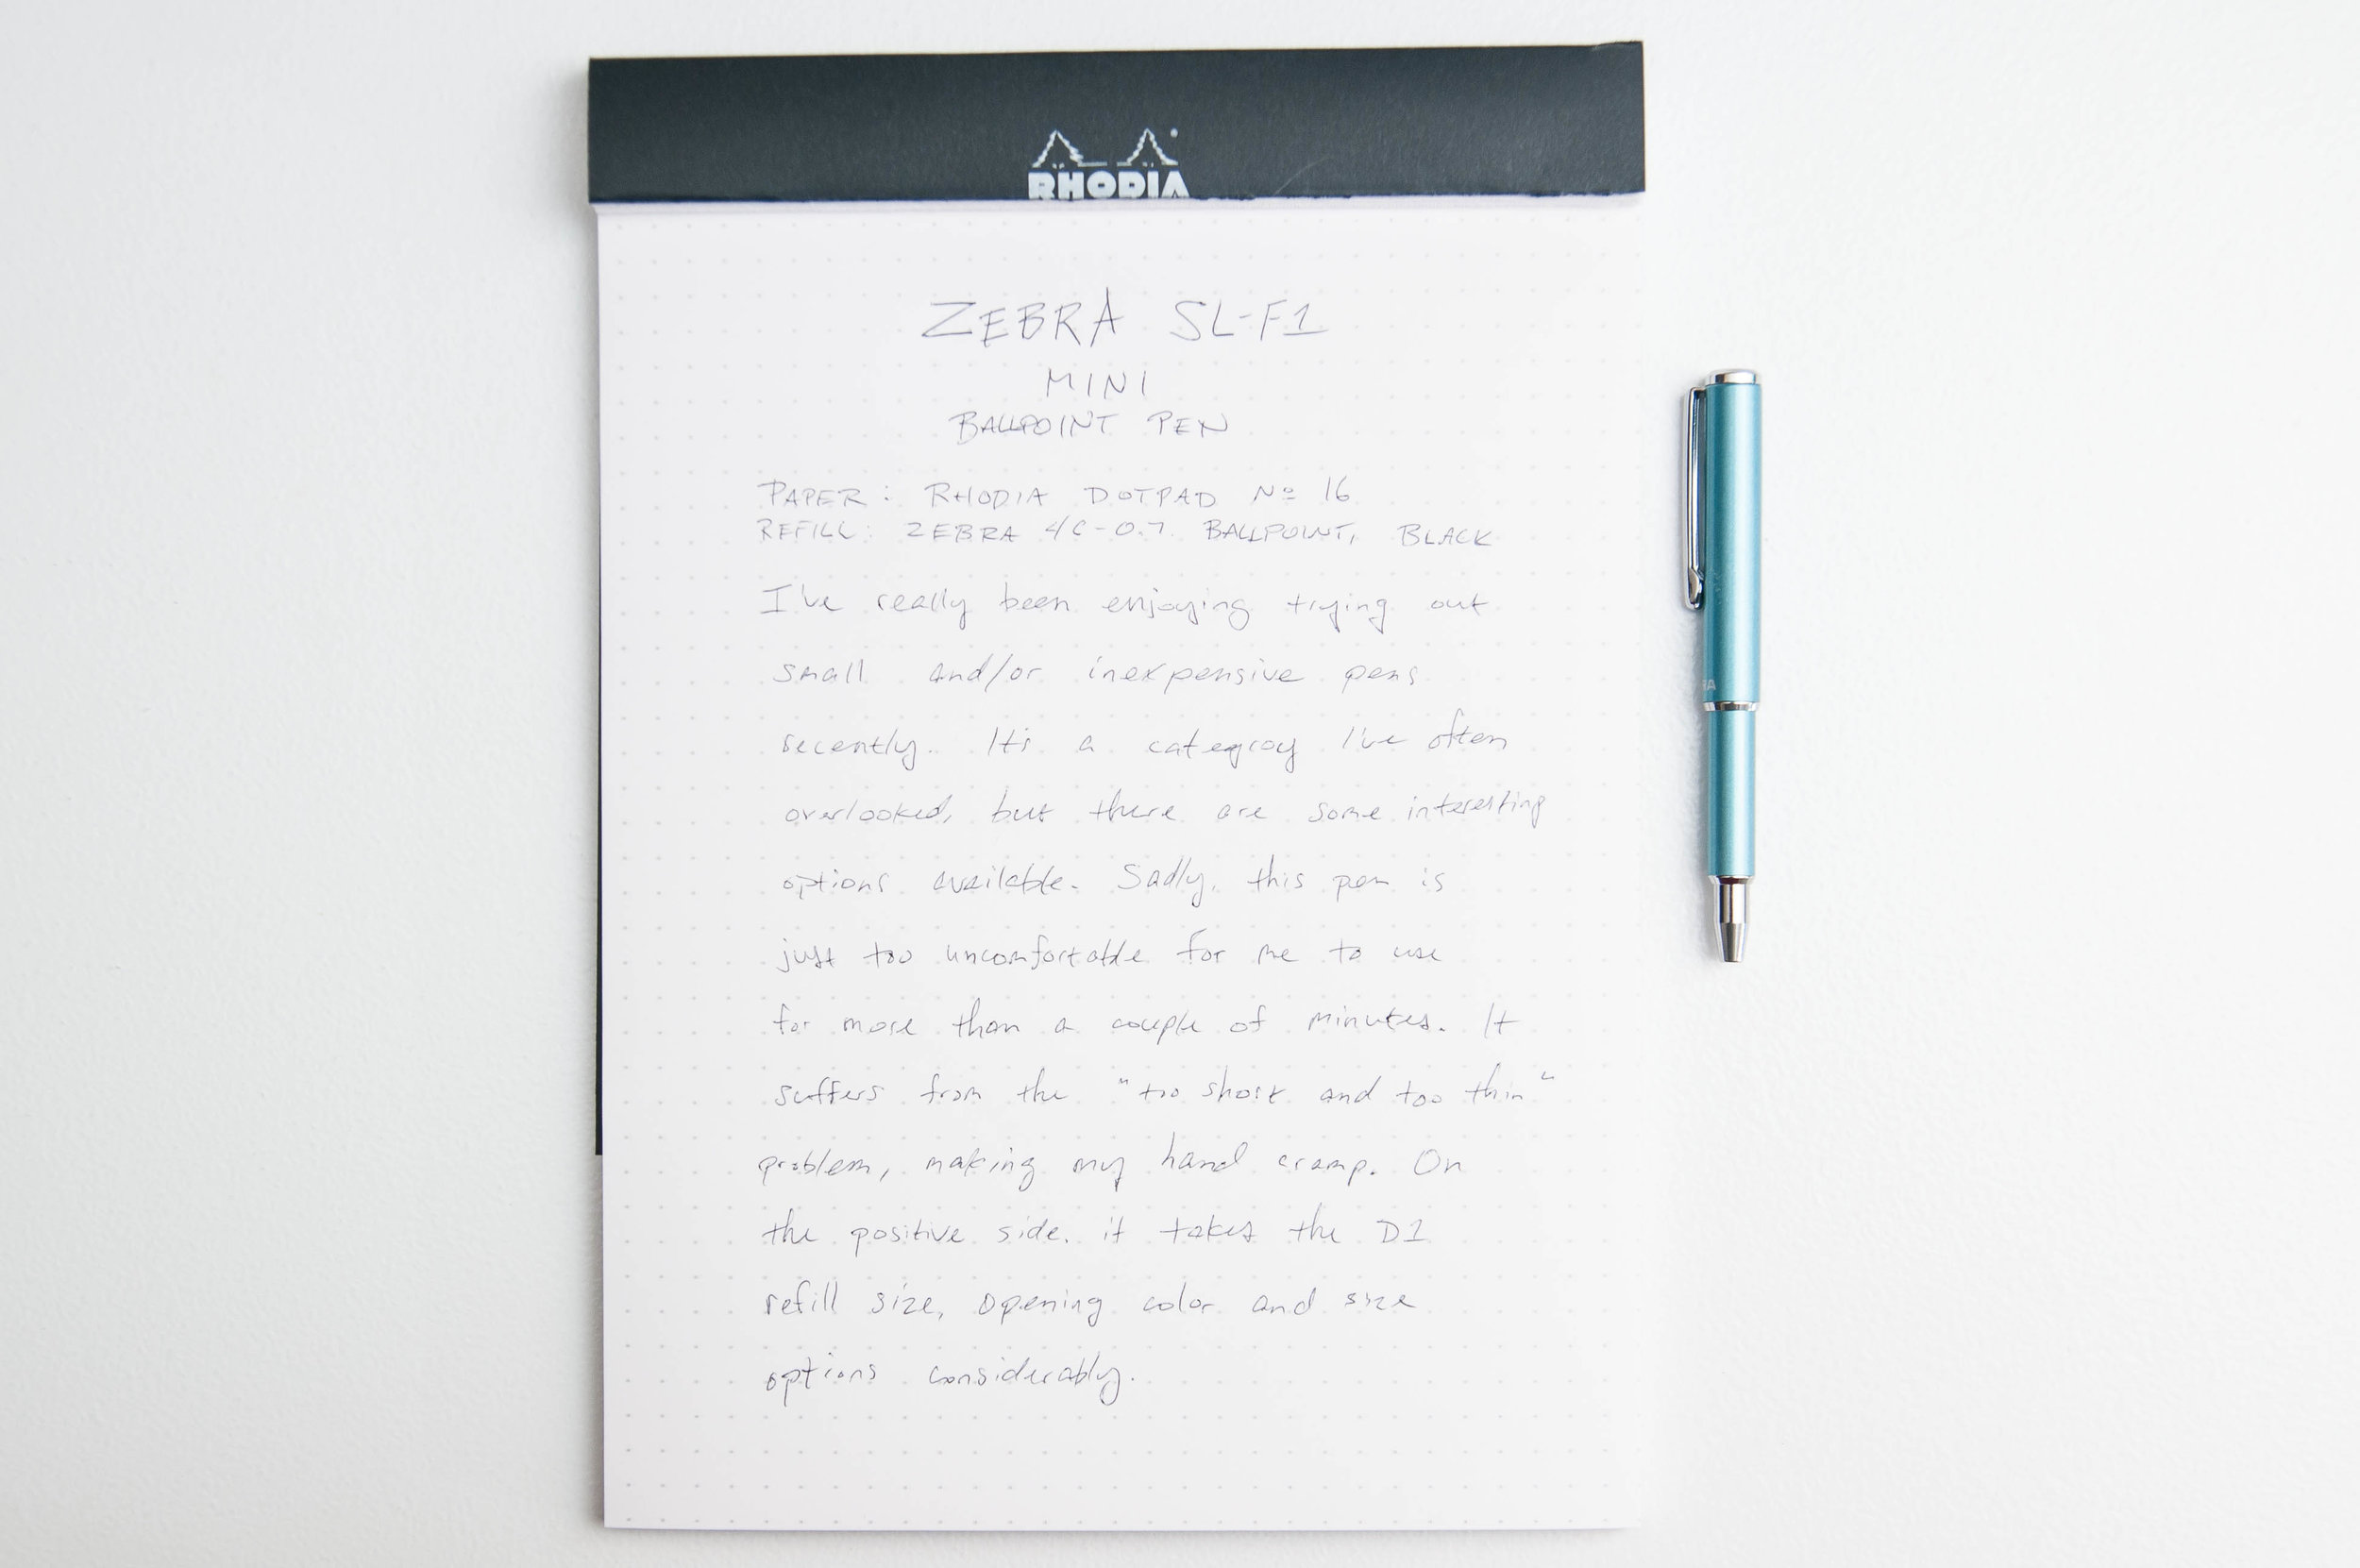 Zebra SL-F1 Mini Ballpoint Pen Writing